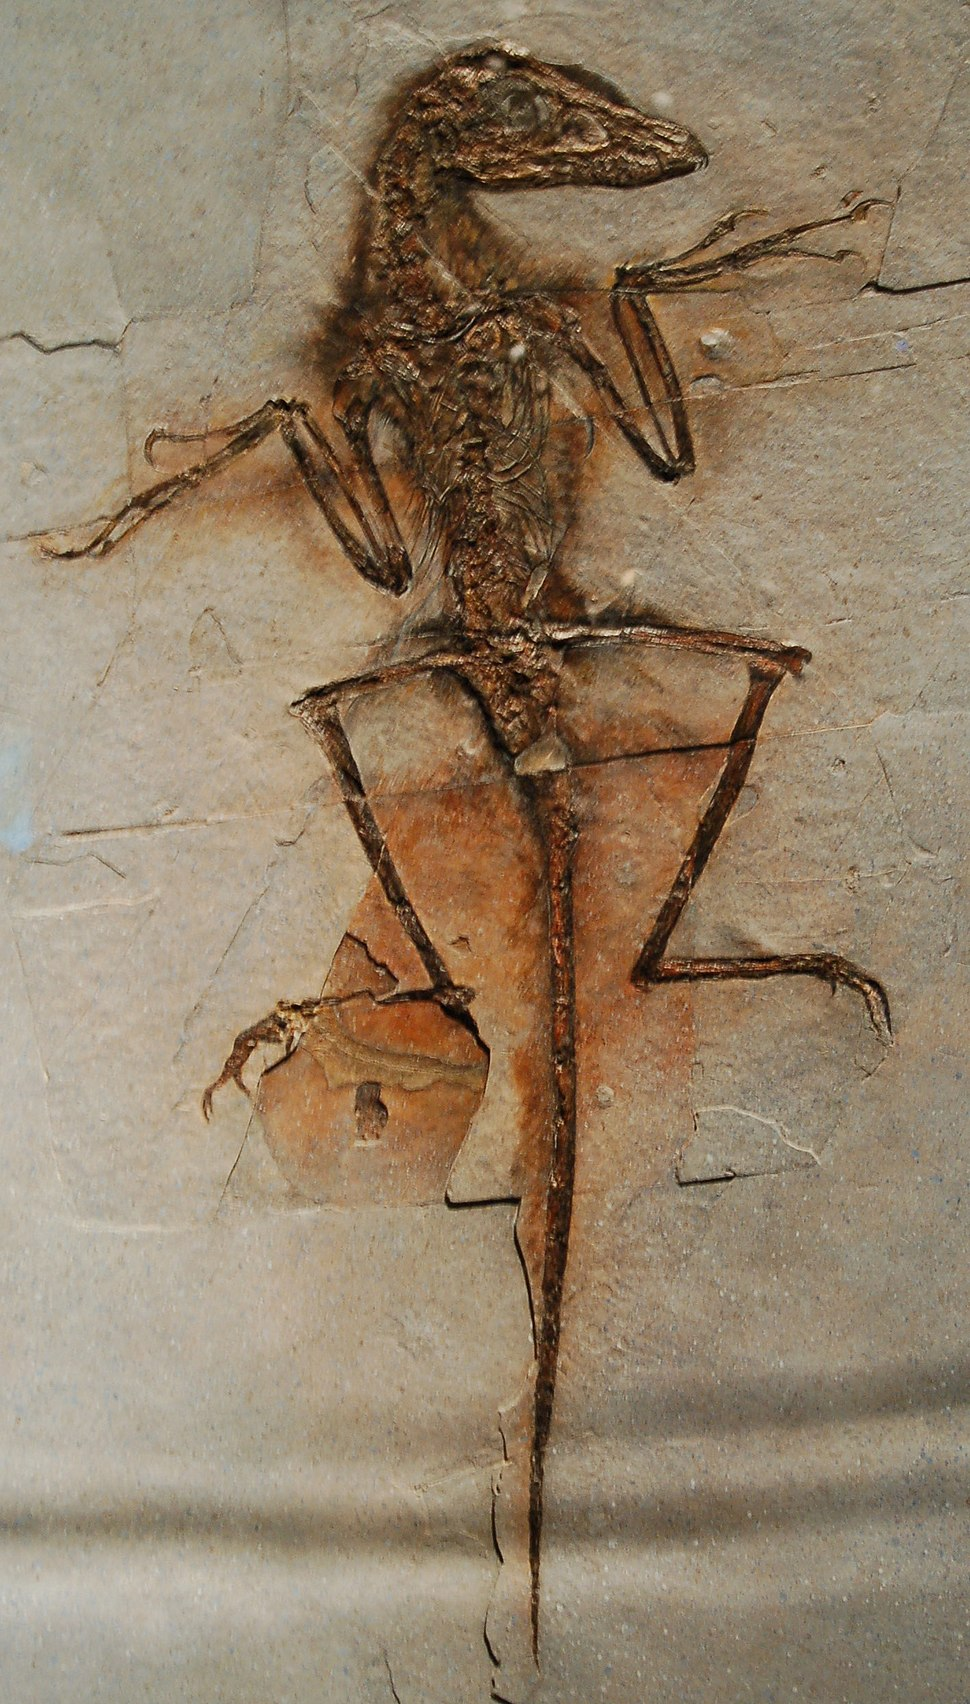 Sinornithosaurus Dave NGMC91